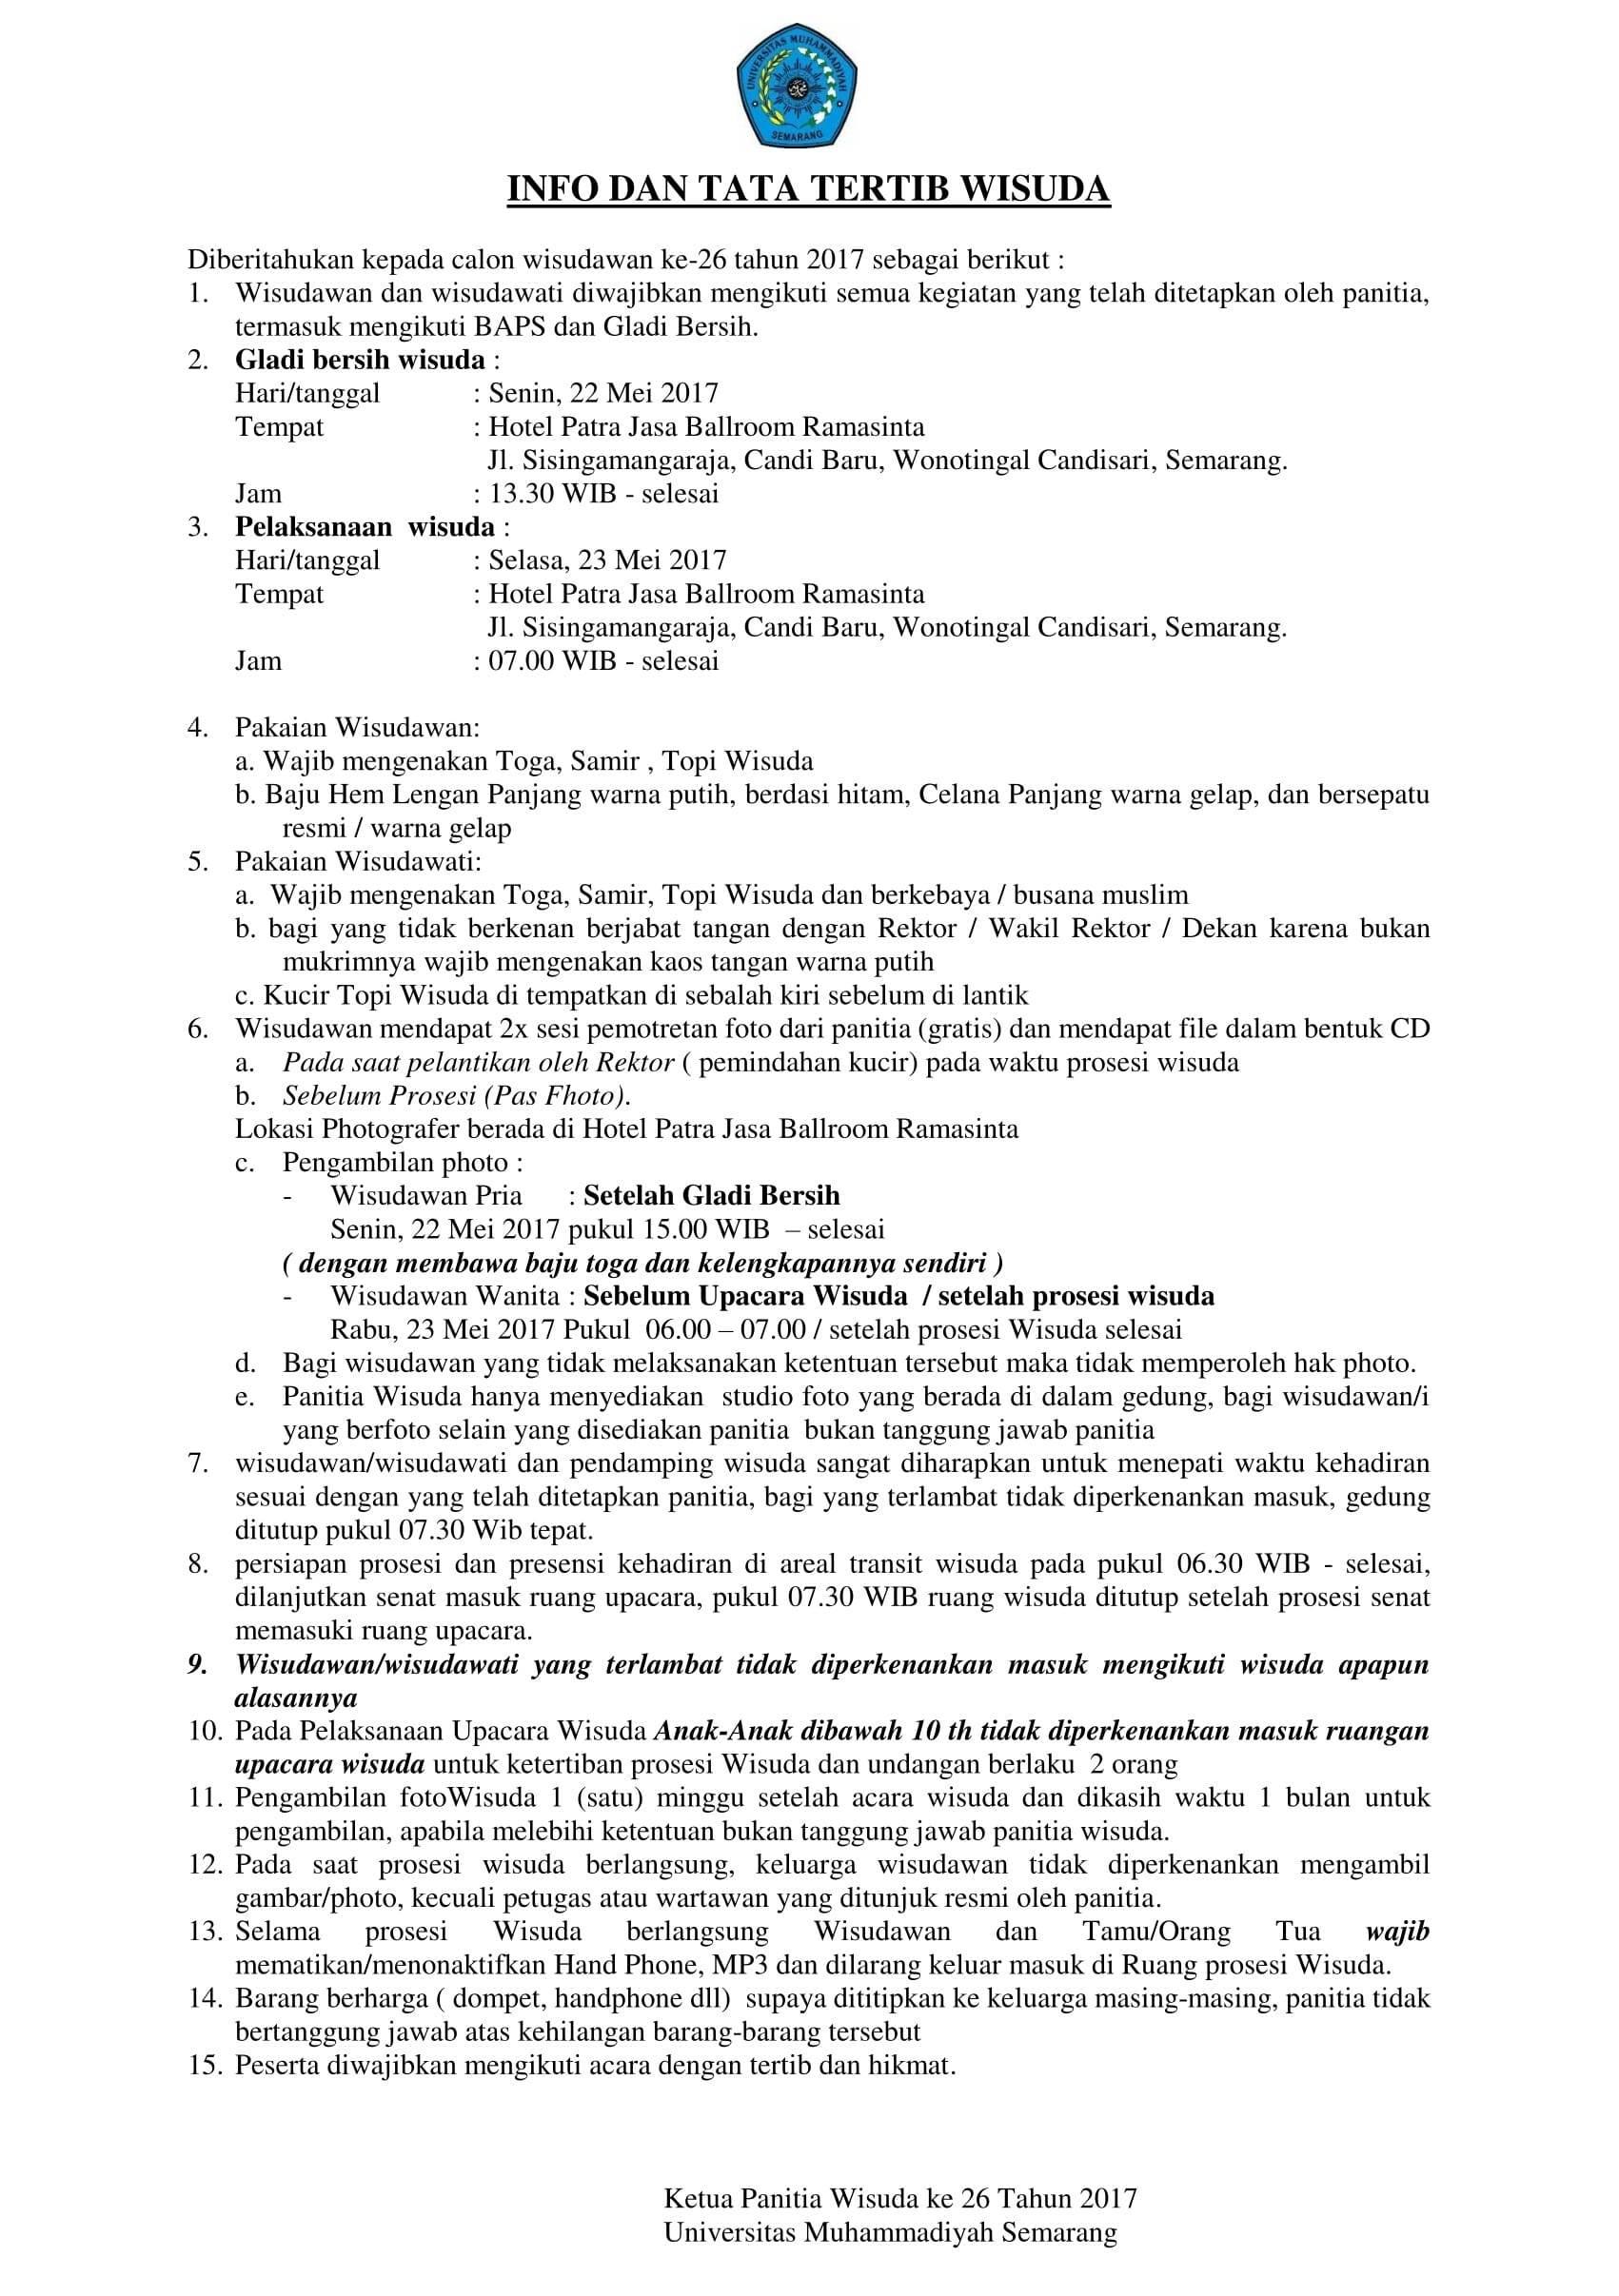 INFO WISUDA dan TATA TERTIB WISUDA 26 pdf-1